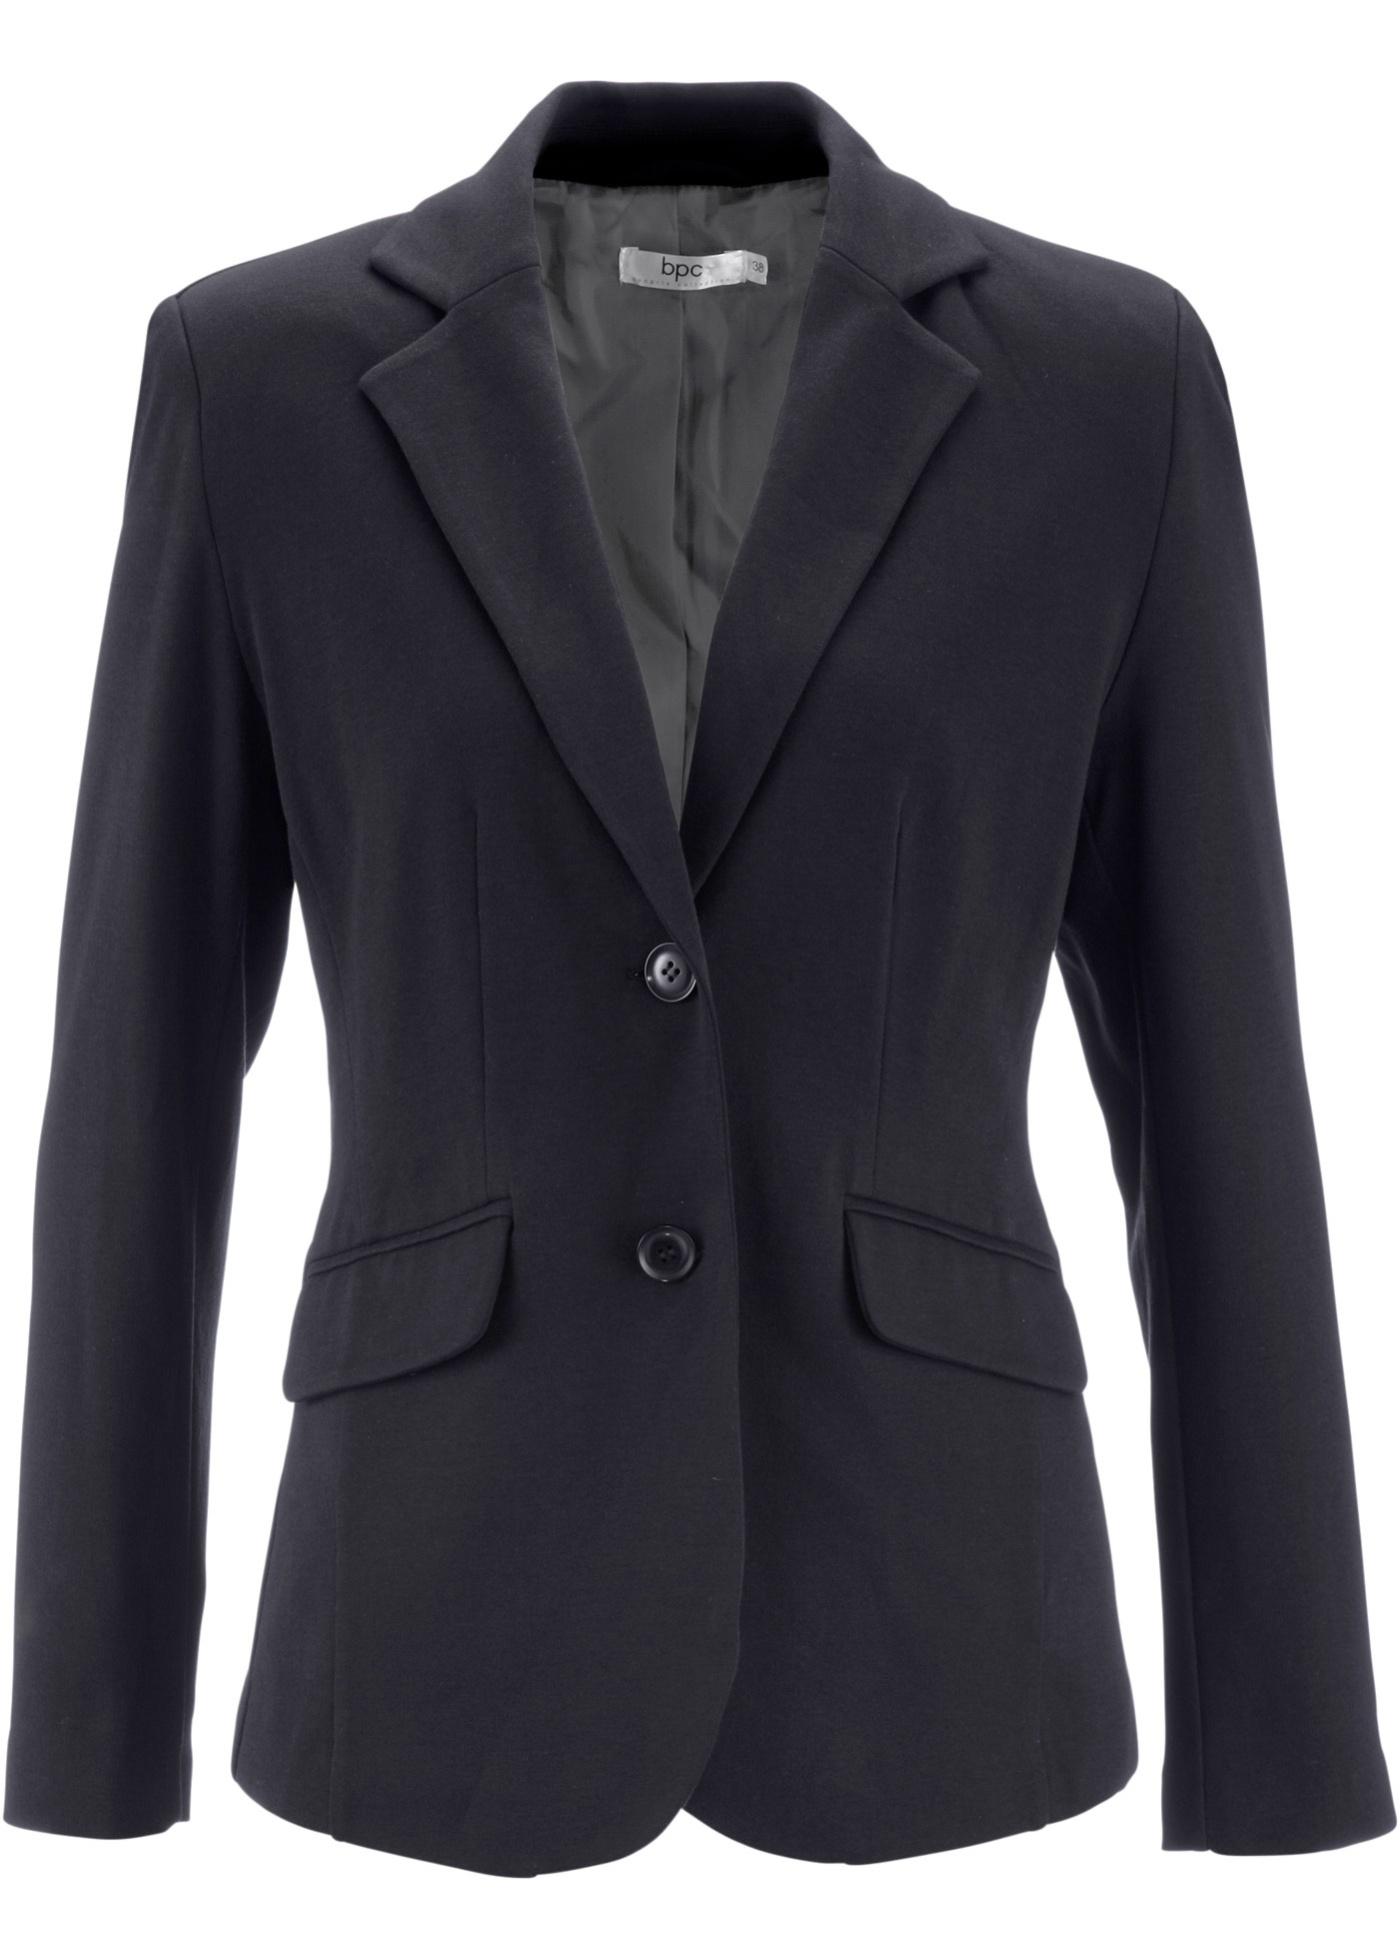 Image of Baumwoll Jersey-Blazer, tailliert